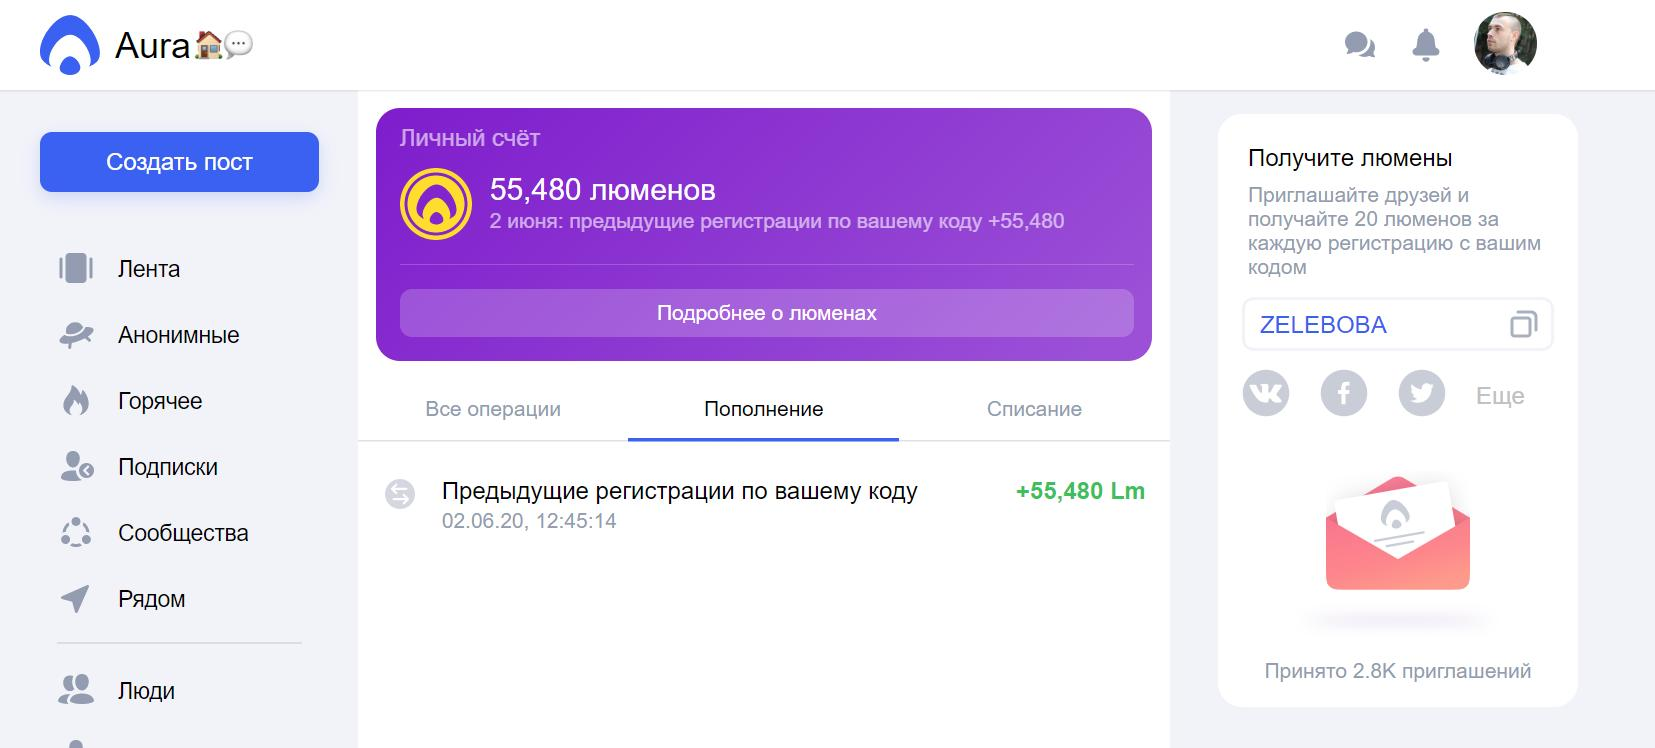 Яндекс.Аура начала раздавать внутреннюю валюту